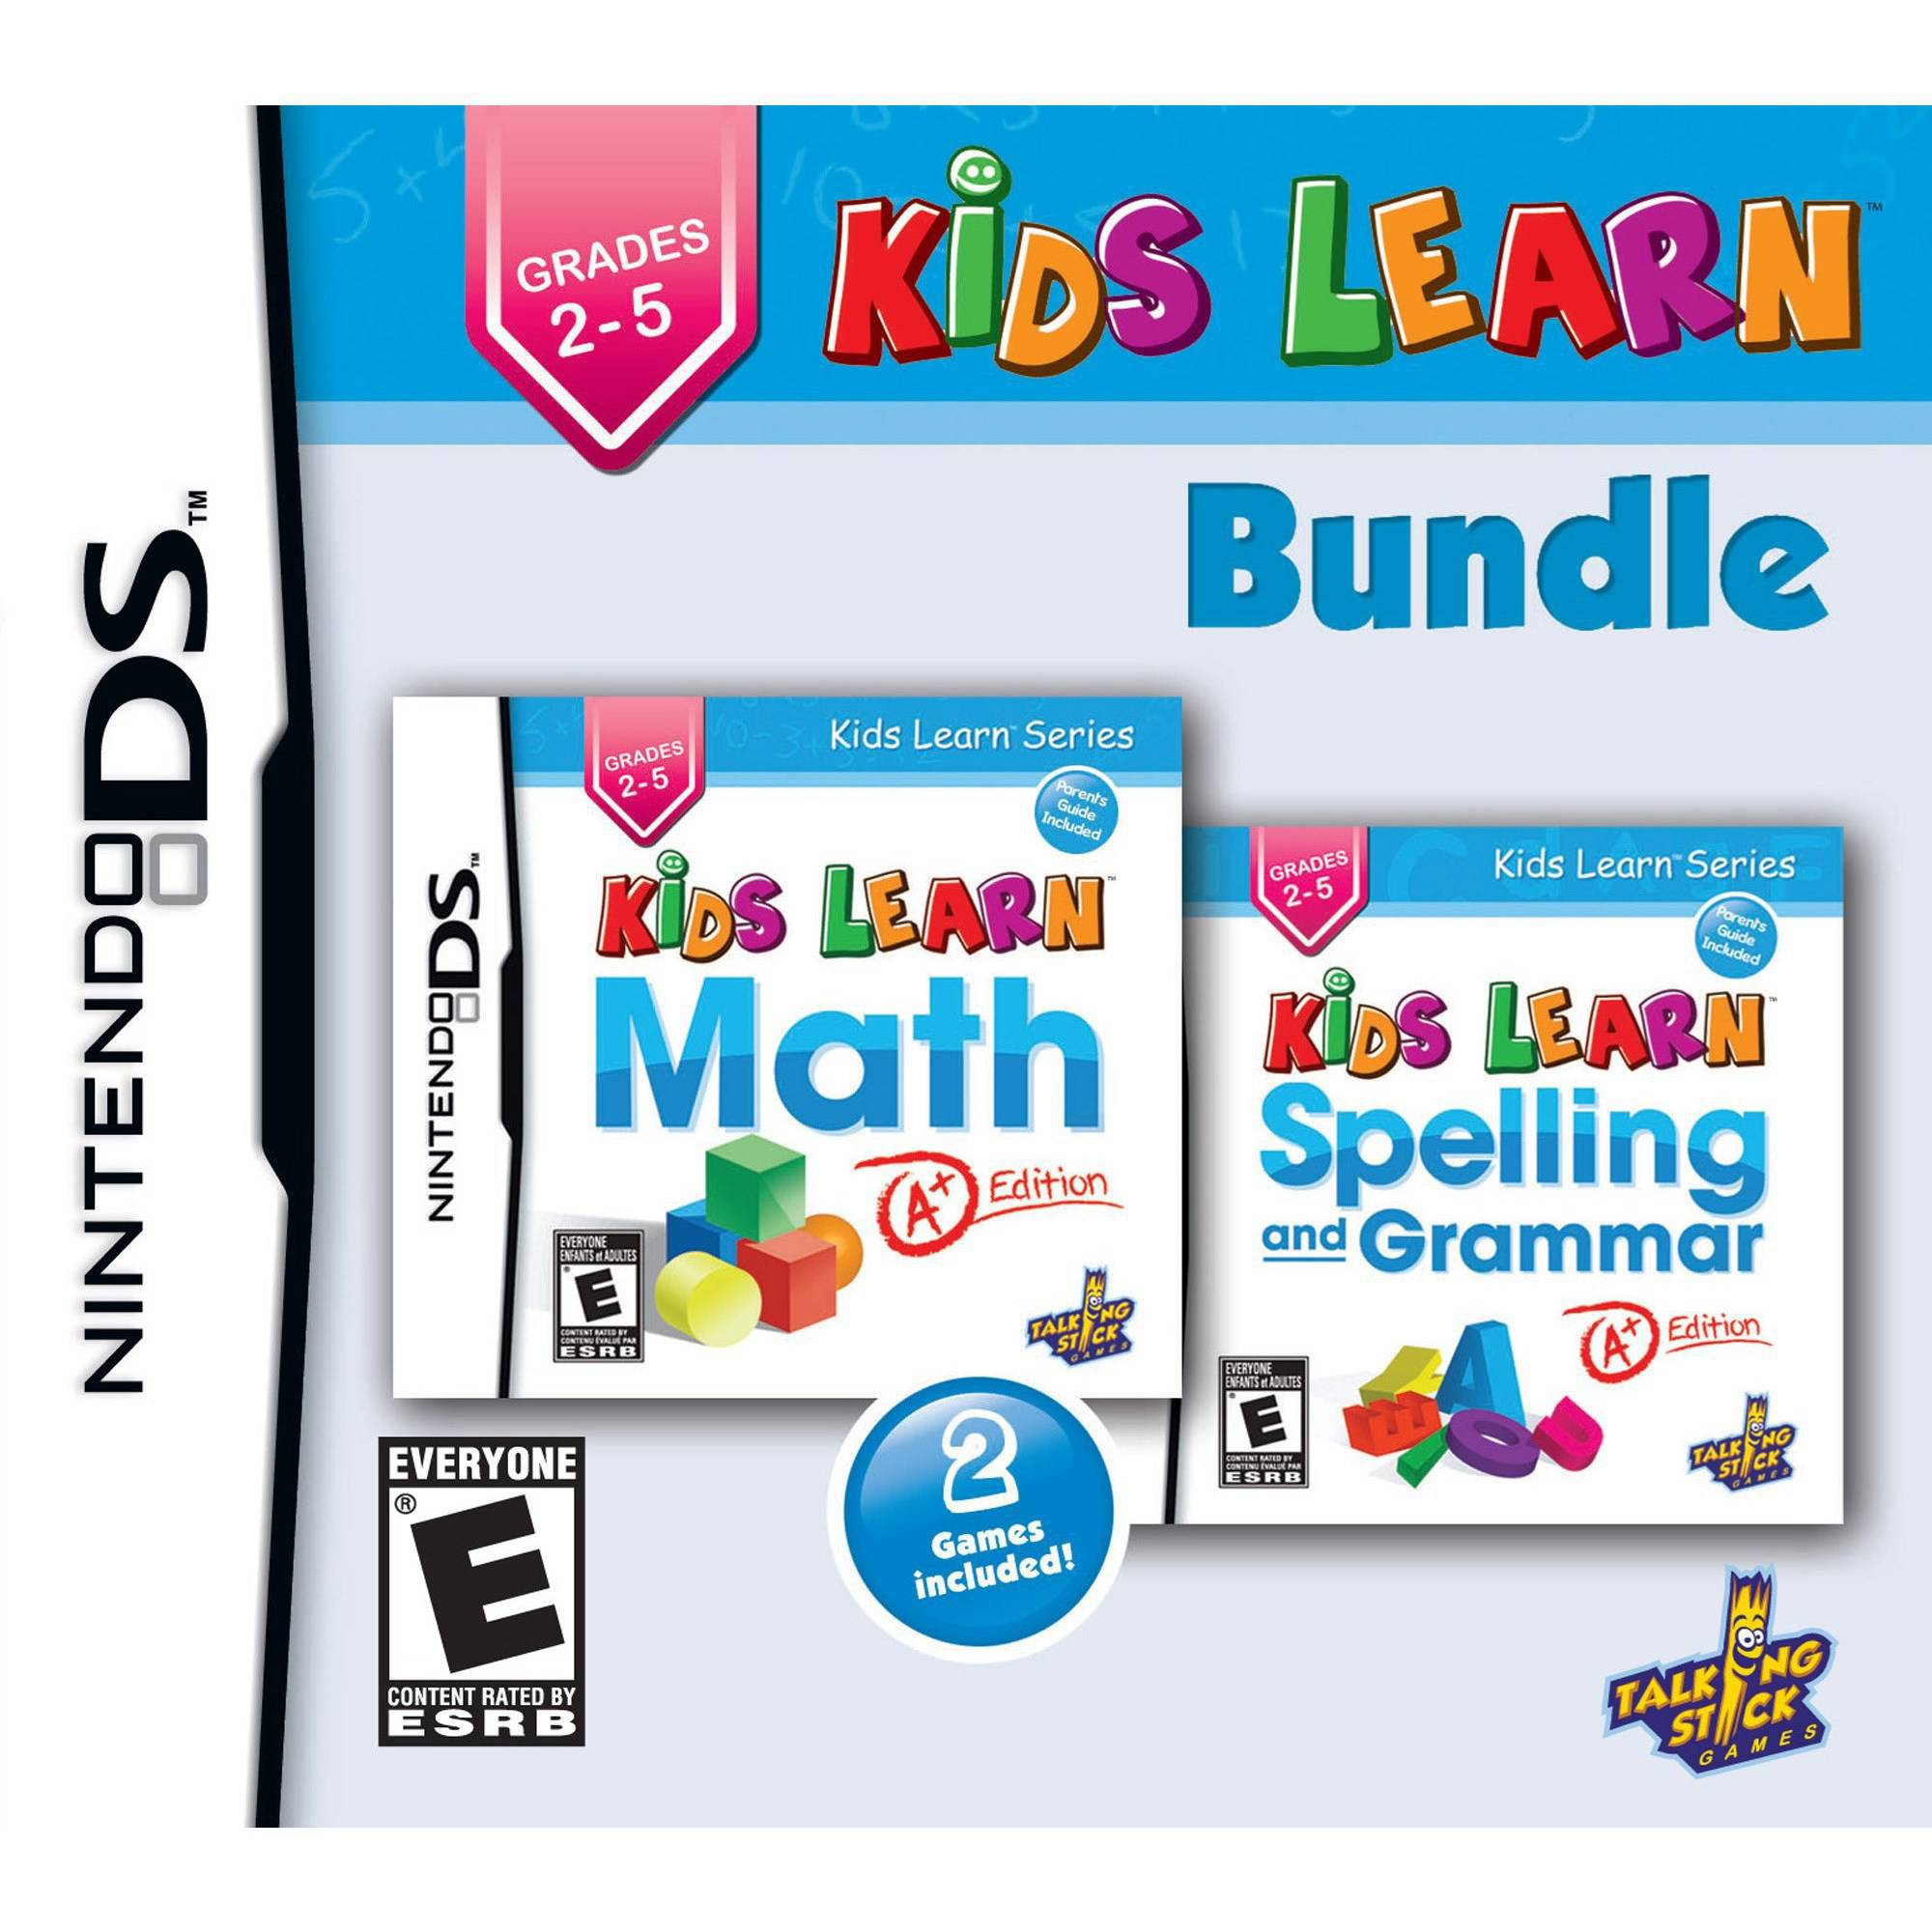 Kid Learn Math A+ / Kids Learn Spelling and Grammar A+ Bu...